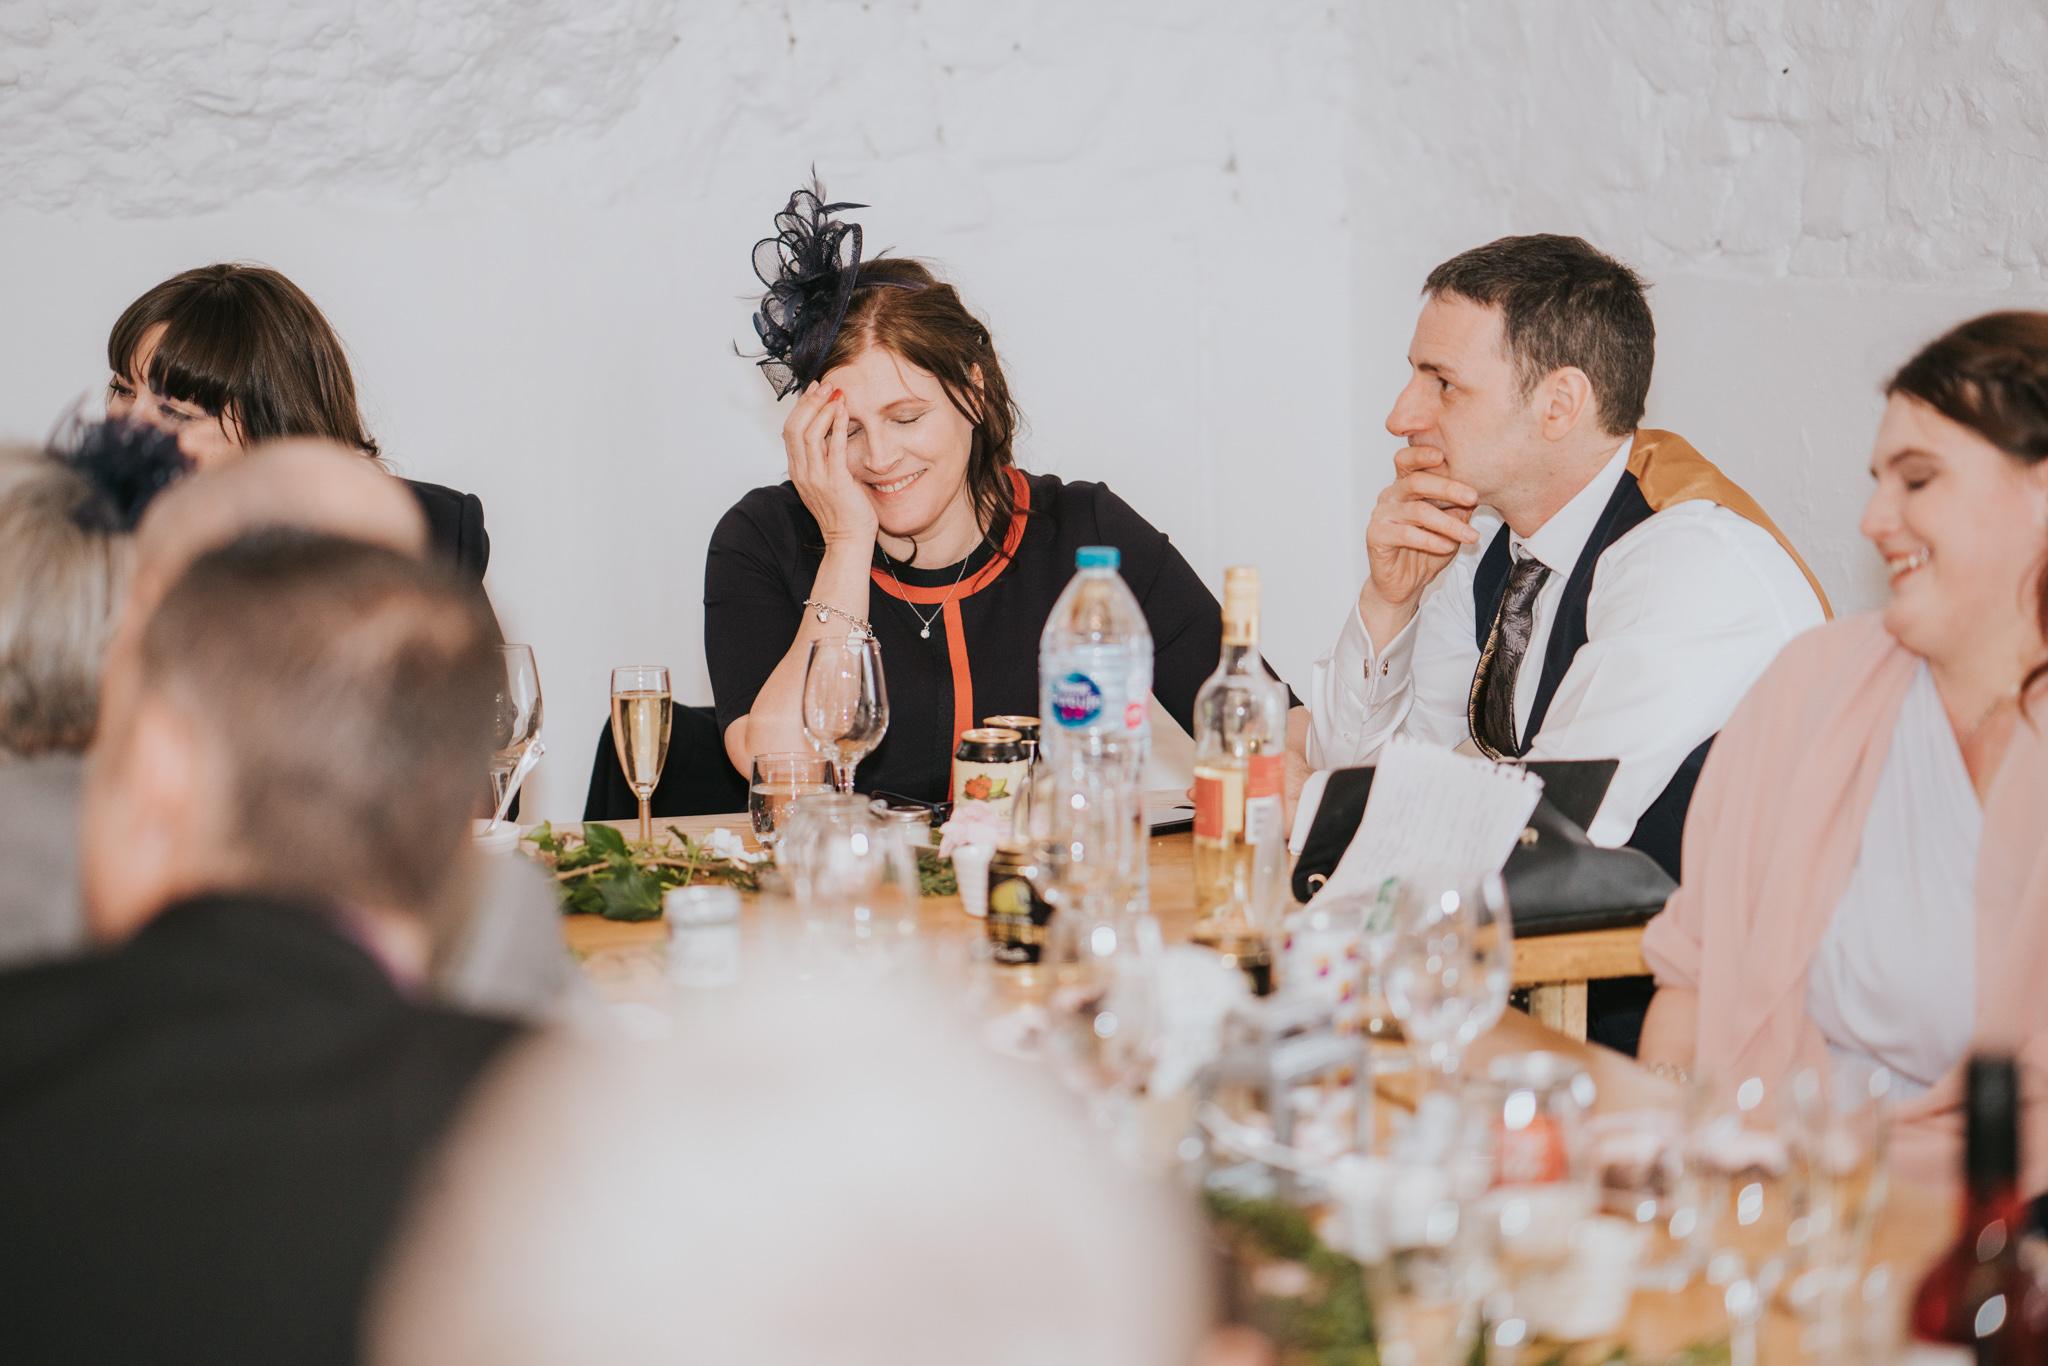 grace-sam-old-barn-clovelly-devon-wedding-photographer-grace-elizabeth-essex-suffolk-norfolk-wedding-photographer (92 of 132).jpg